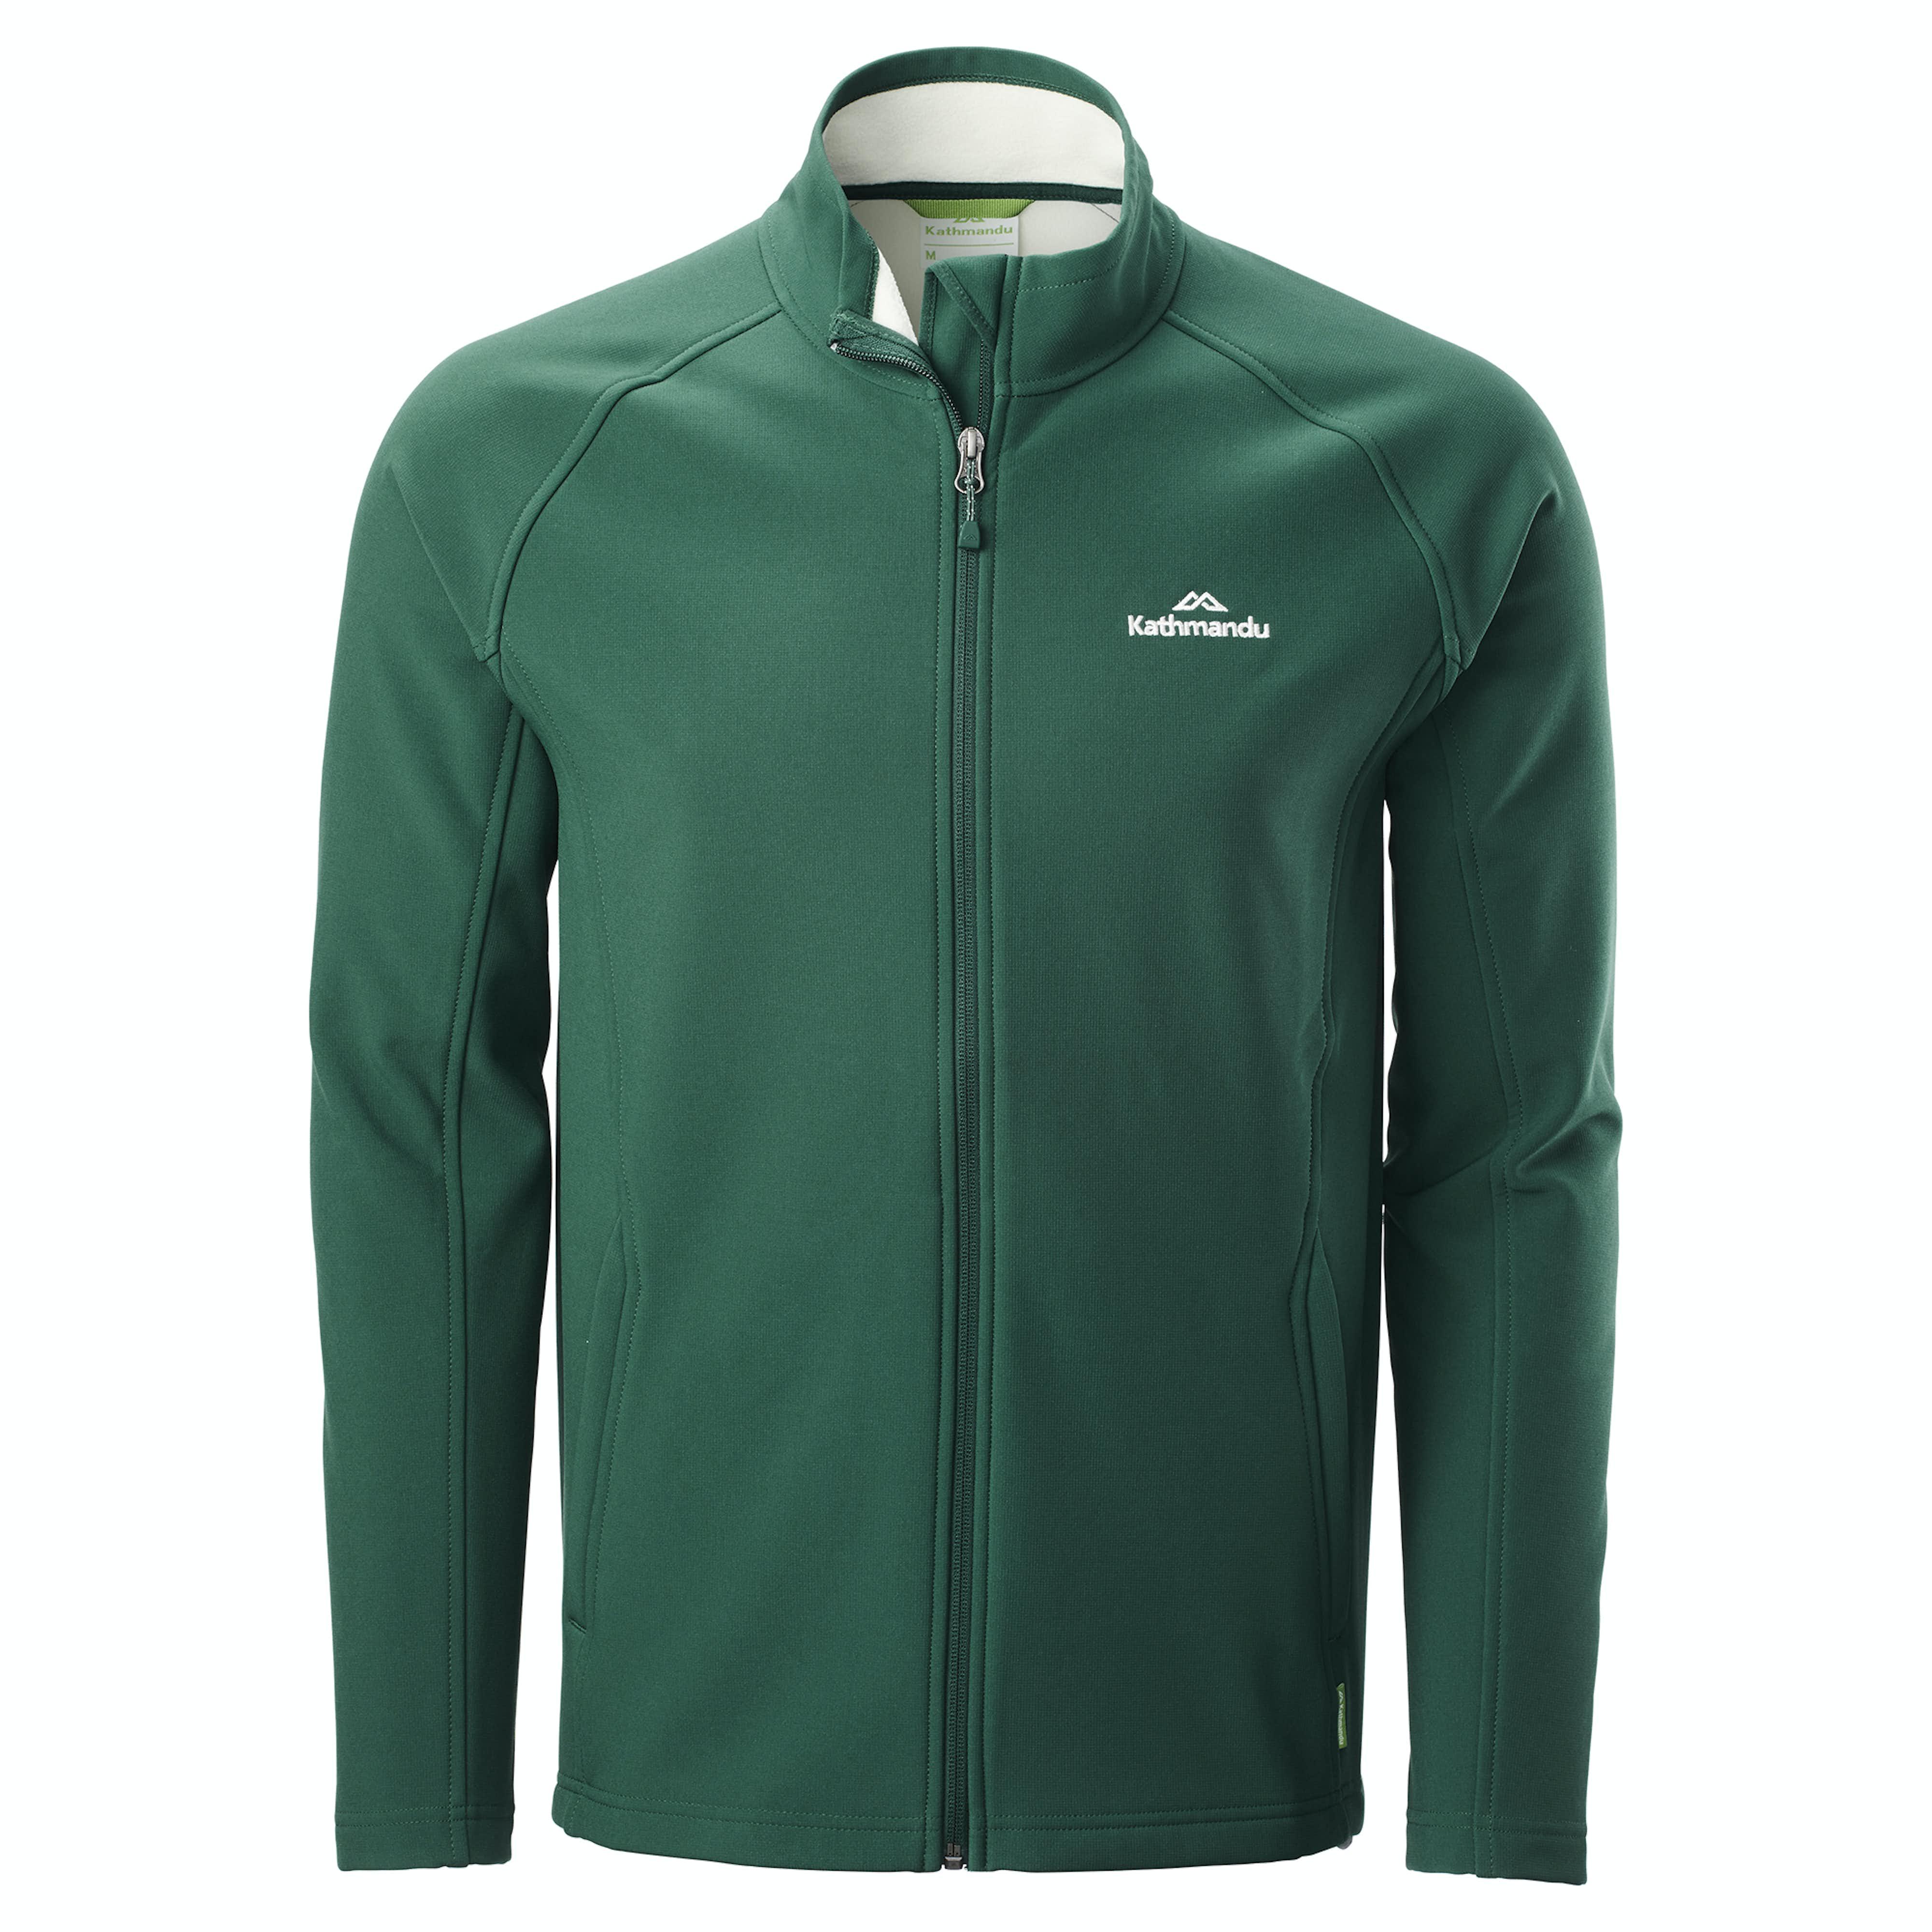 ff35105f Mens Jackets for Sale Online | Winter Coats for Men in Australia